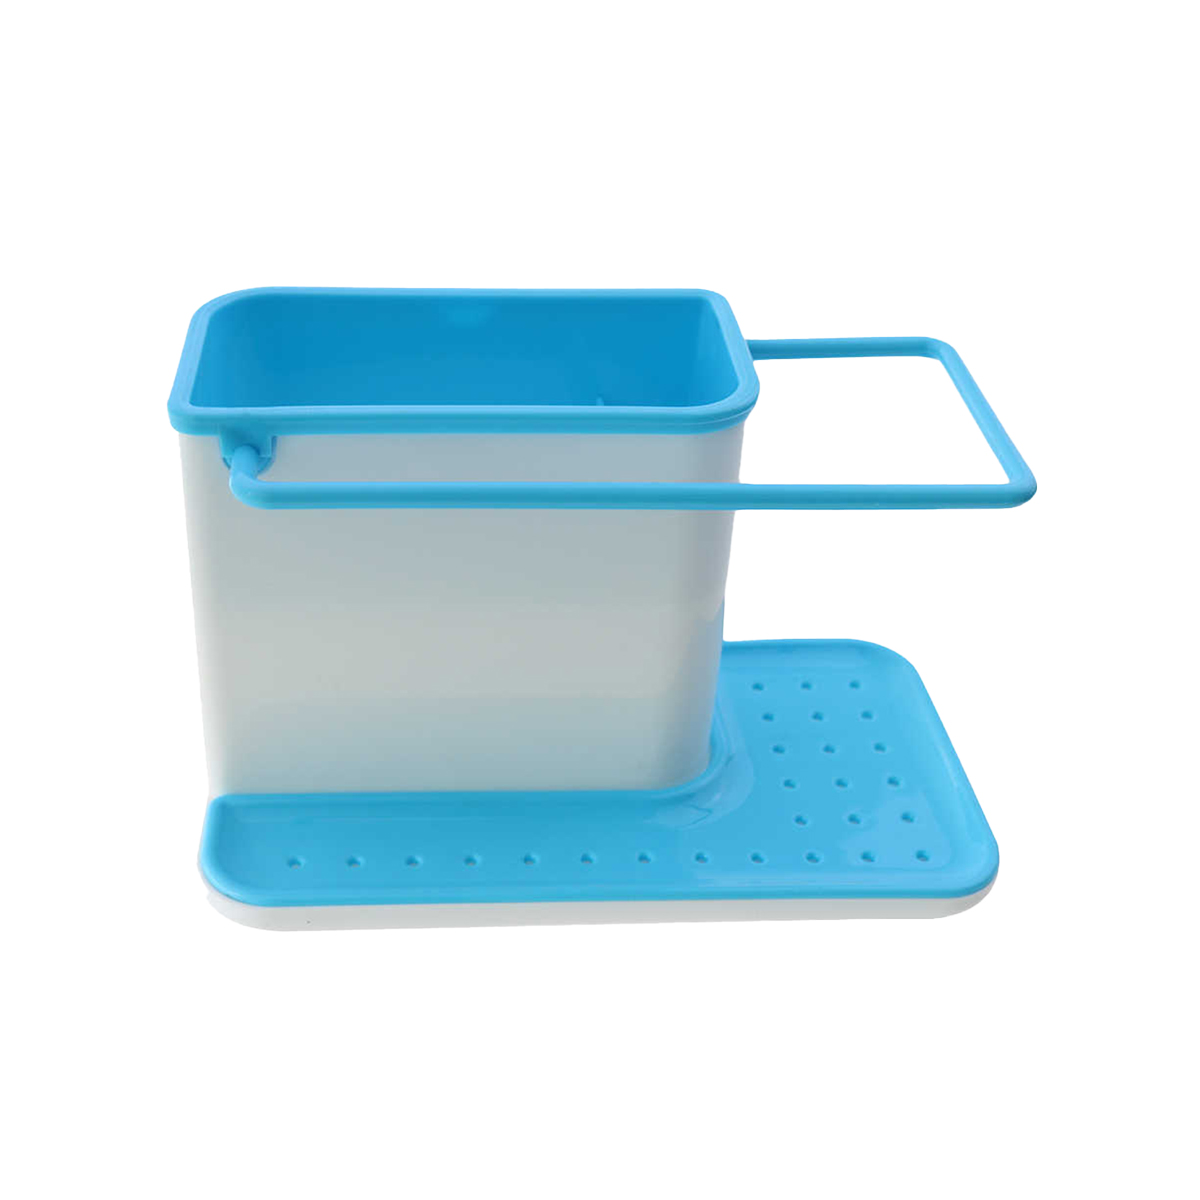 Органайзер для ванной Blonder Home голубой, 21х11,4х13,5